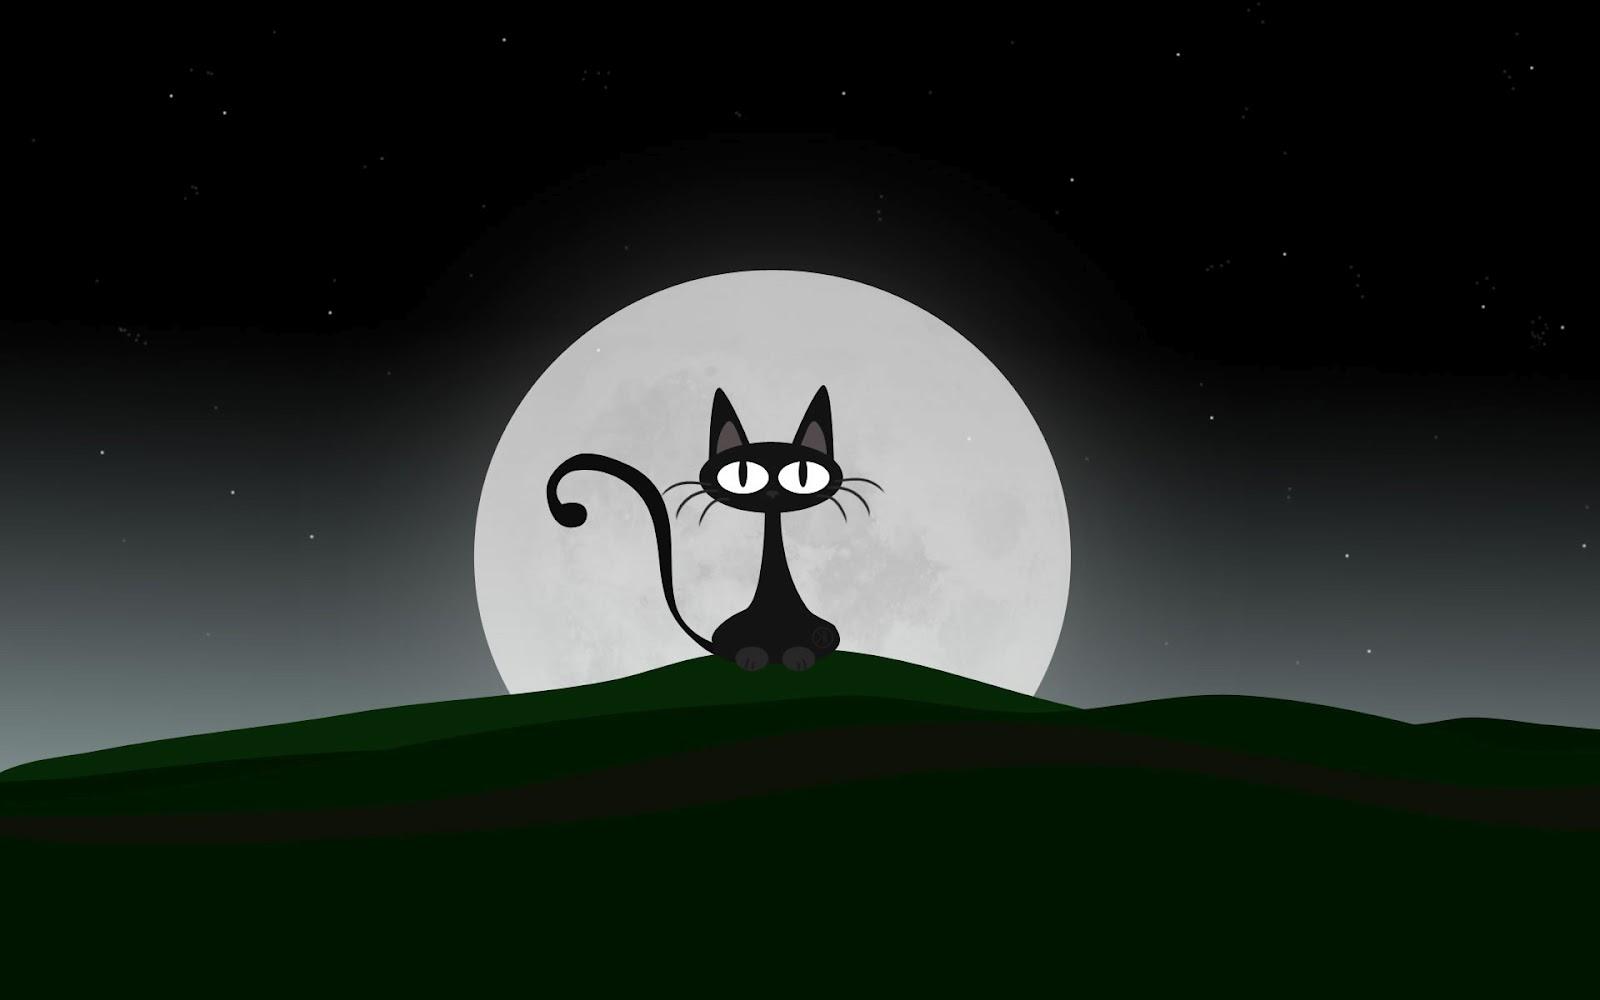 Hoy Me Cruce Con Un Gato Negro Pobre Gato Negro